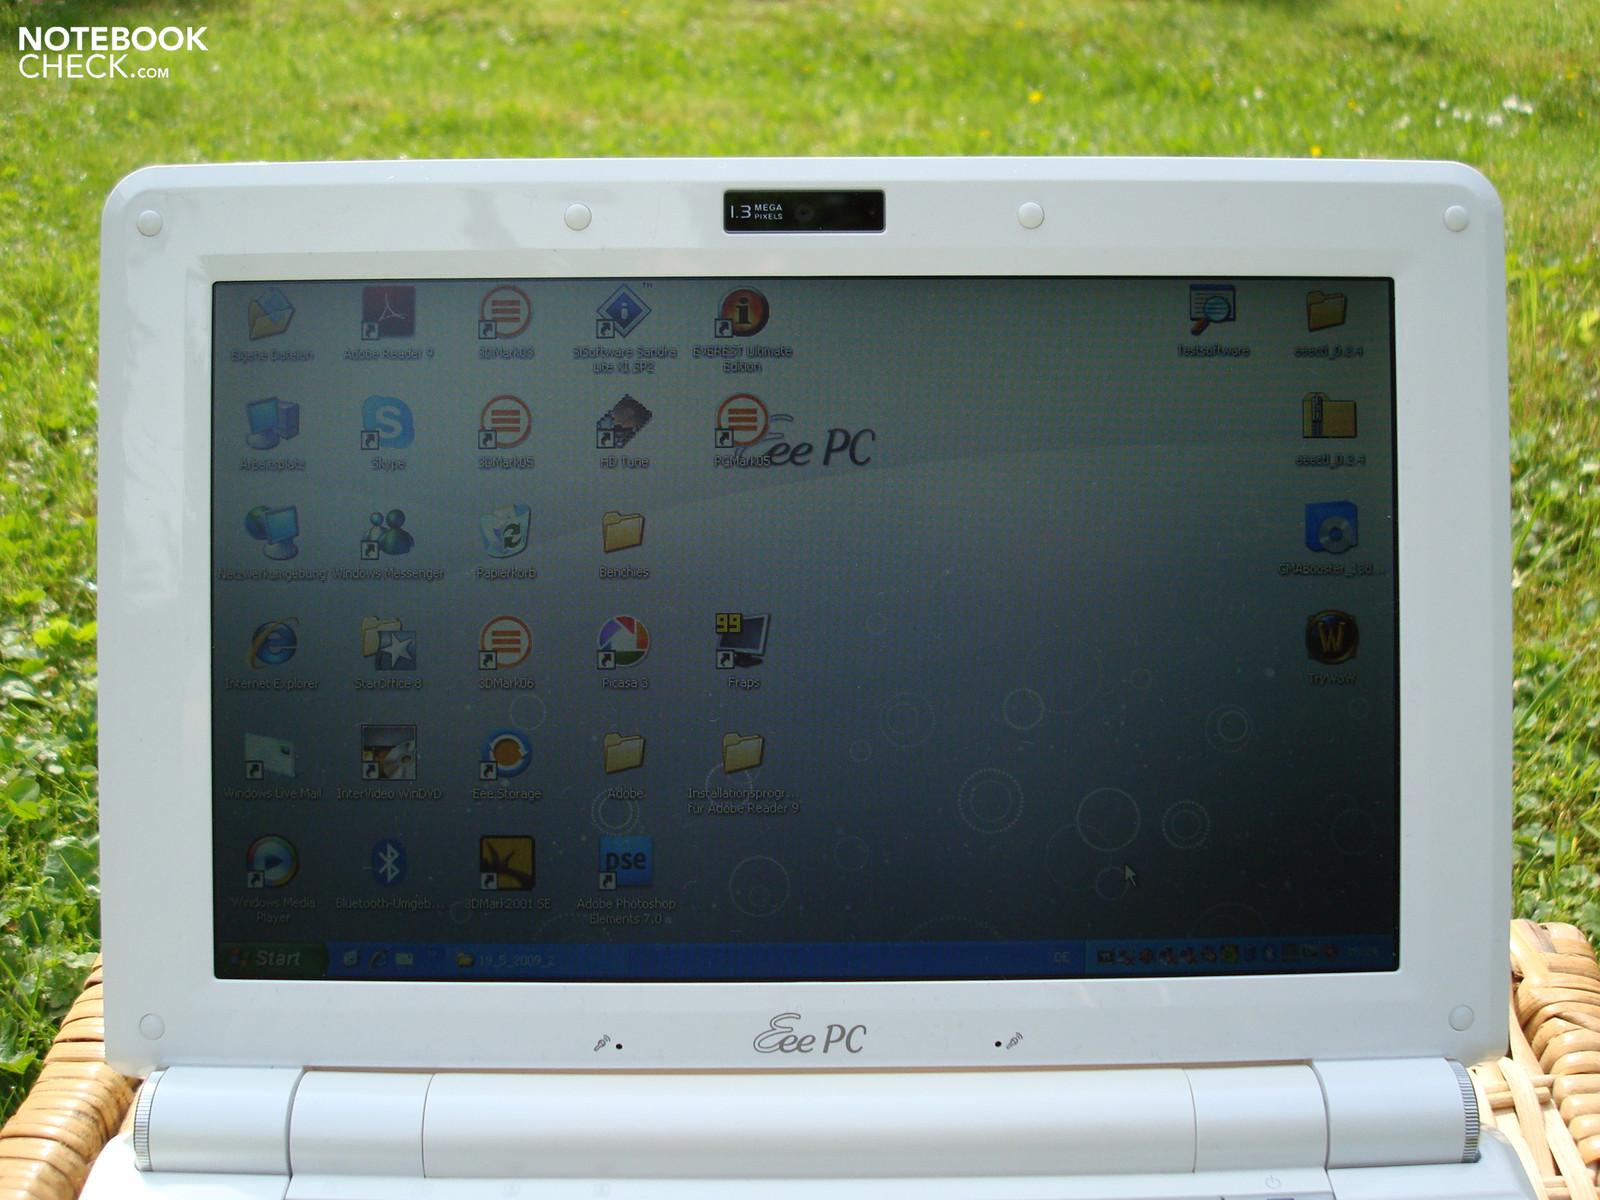 Sony Vaio VPCEF37FX/BI Broadcom Bluetooth Last